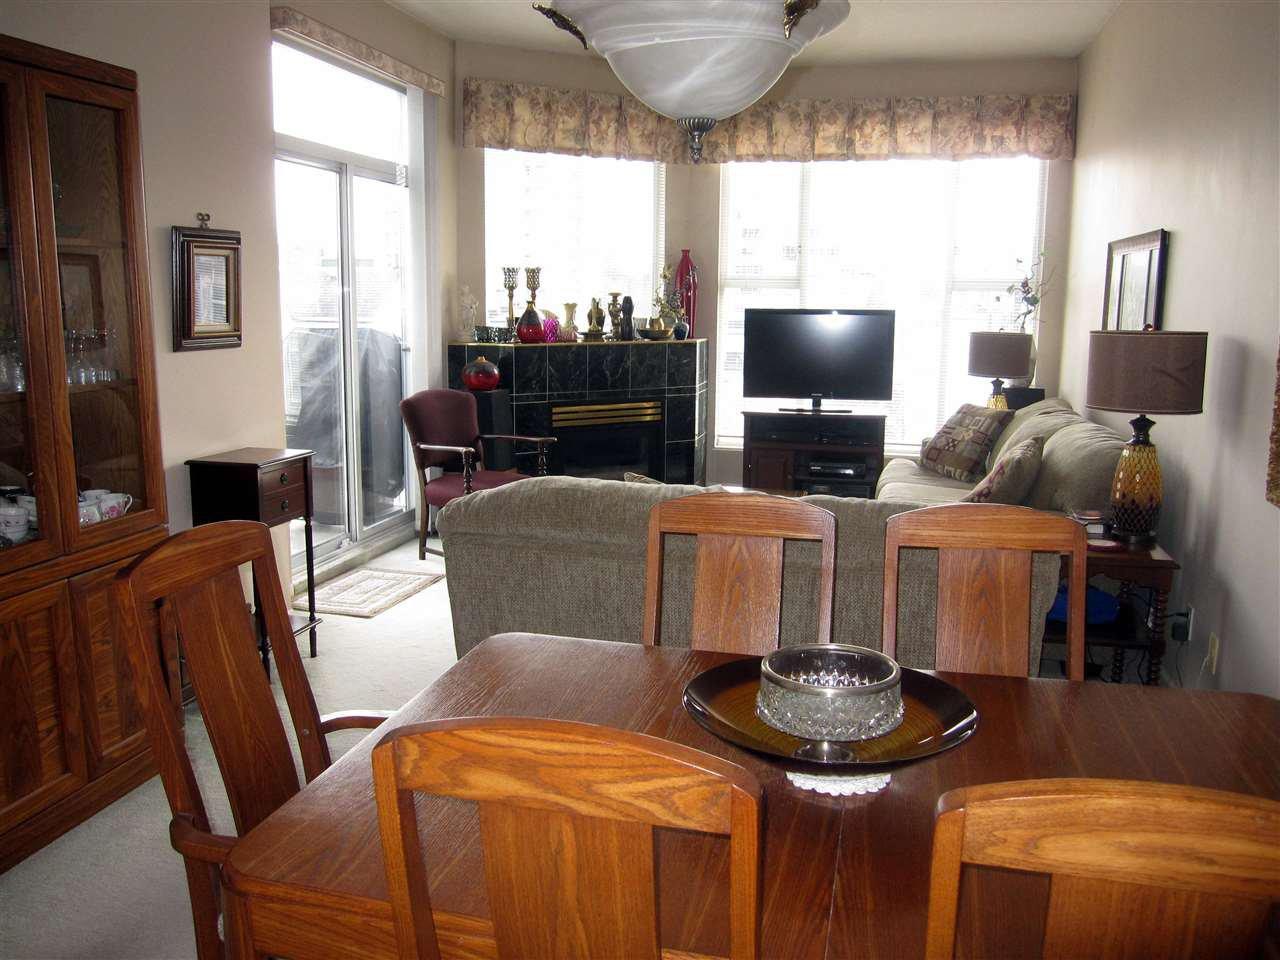 "Photo 4: Photos: 411 12155 191B Street in Pitt Meadows: Central Meadows Condo for sale in ""EDGEPARK MANOR"" : MLS®# R2242064"